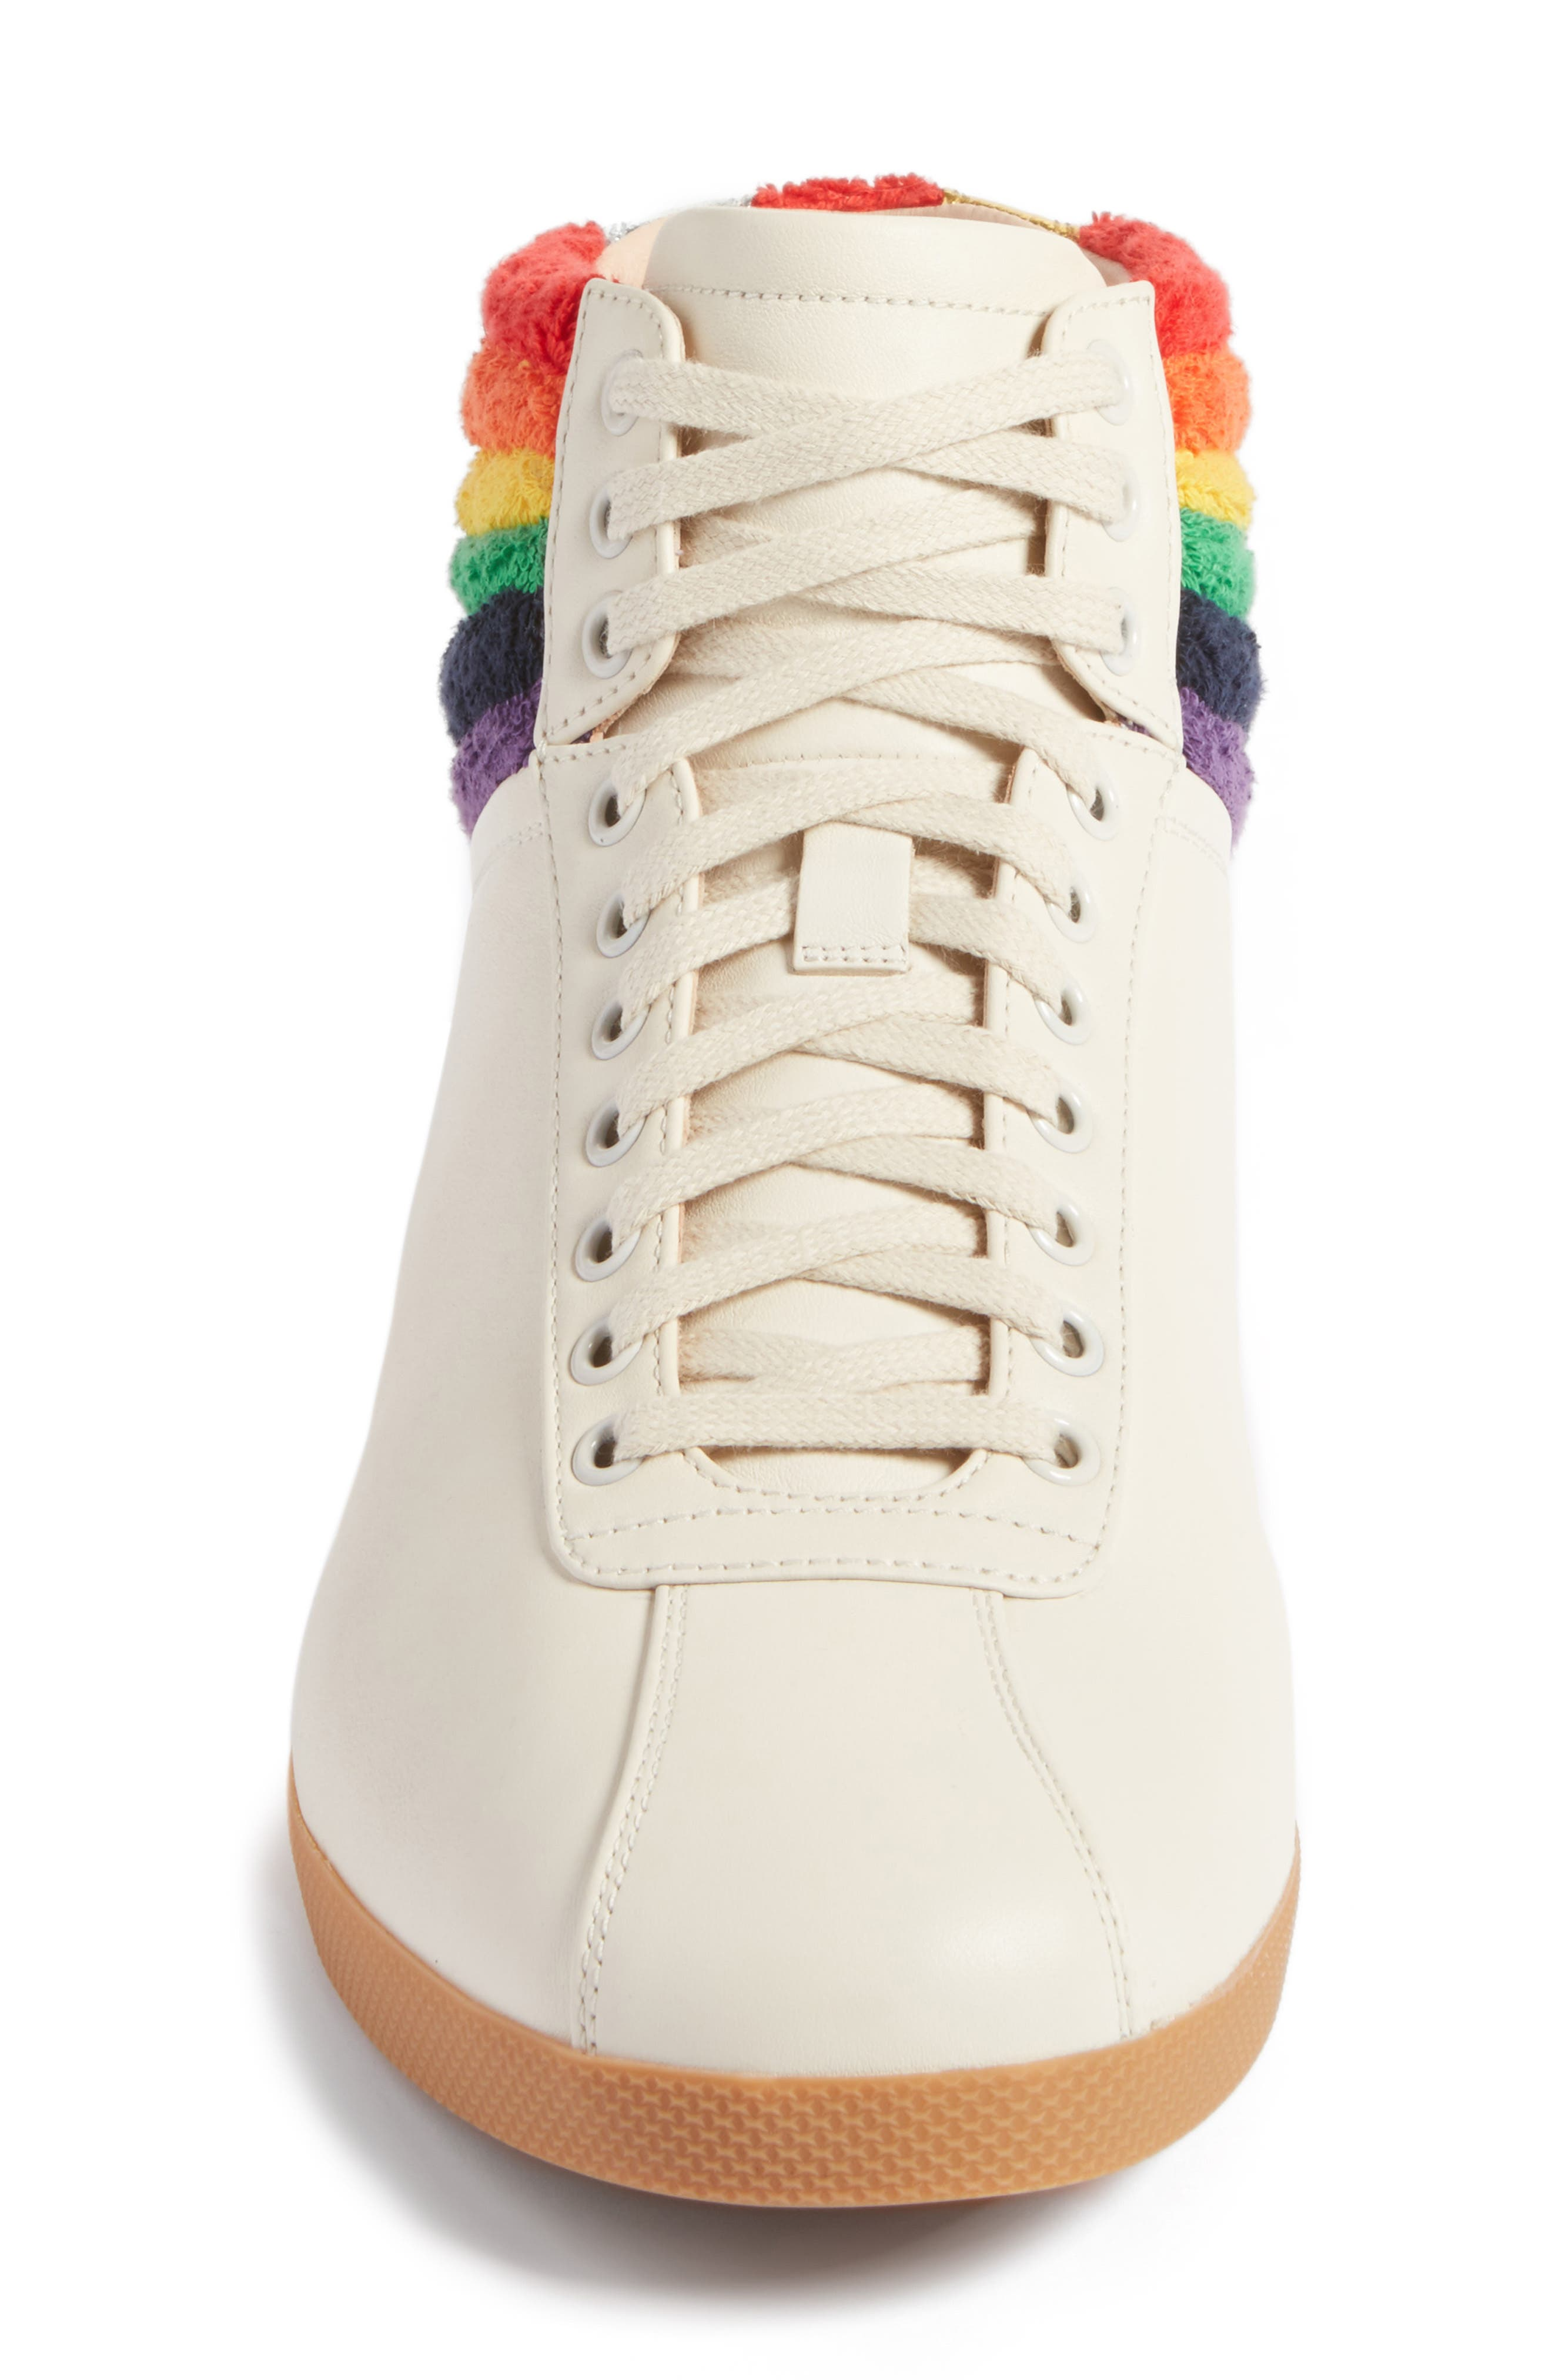 Bambi Rainbow Terry High Top Sneaker,                             Alternate thumbnail 4, color,